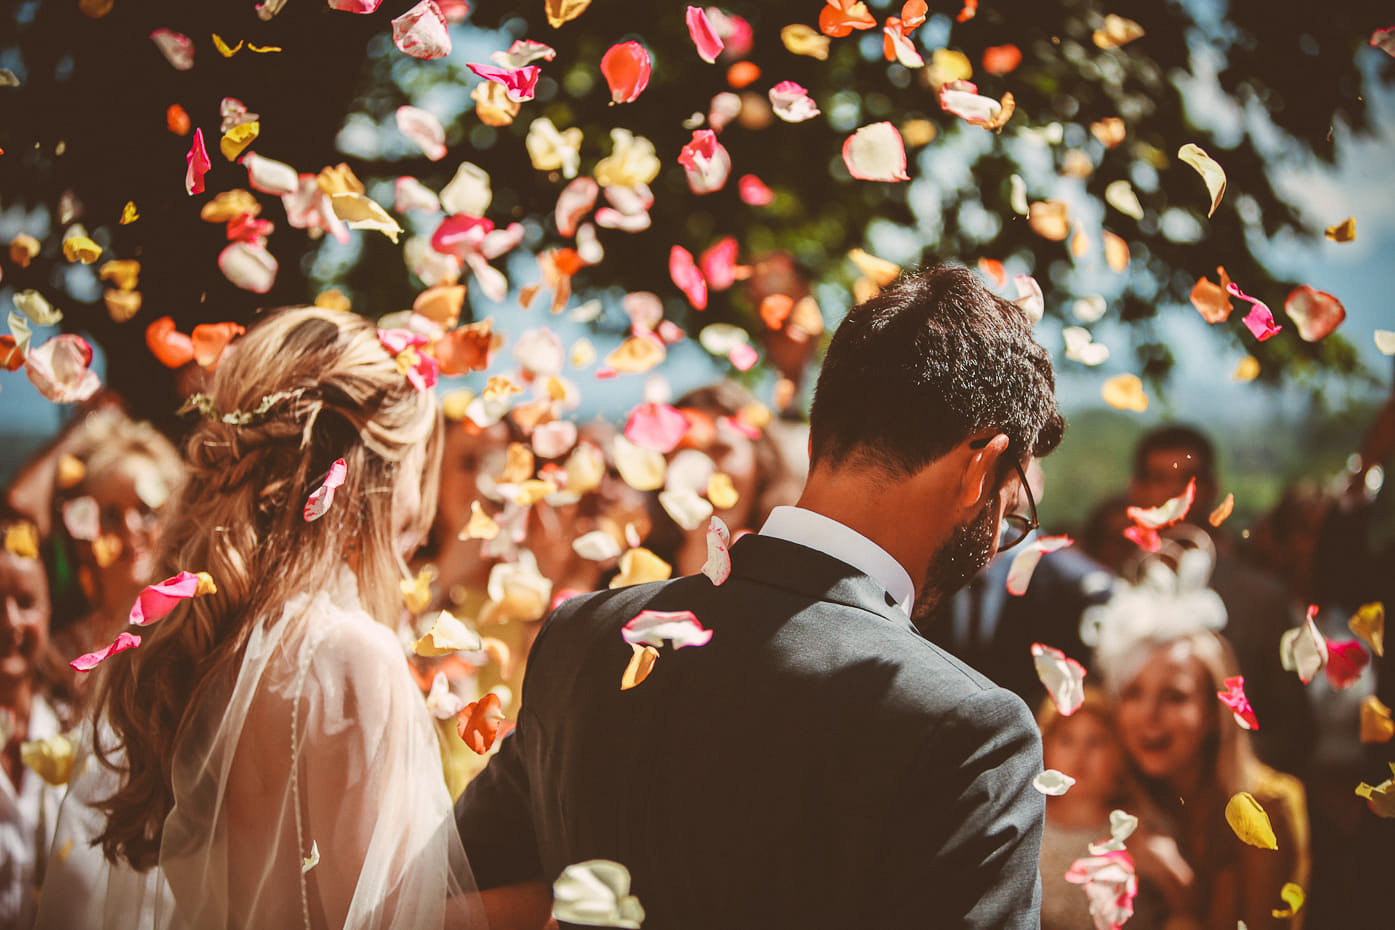 5-photo-ceremonie-eglise-naturel-reportage-photo-mariage-haut-gamme-luxe-chic-boheme-champetre-minimaliste-photographe-aline-ruze-abbaye-valmagne-montpellie-11